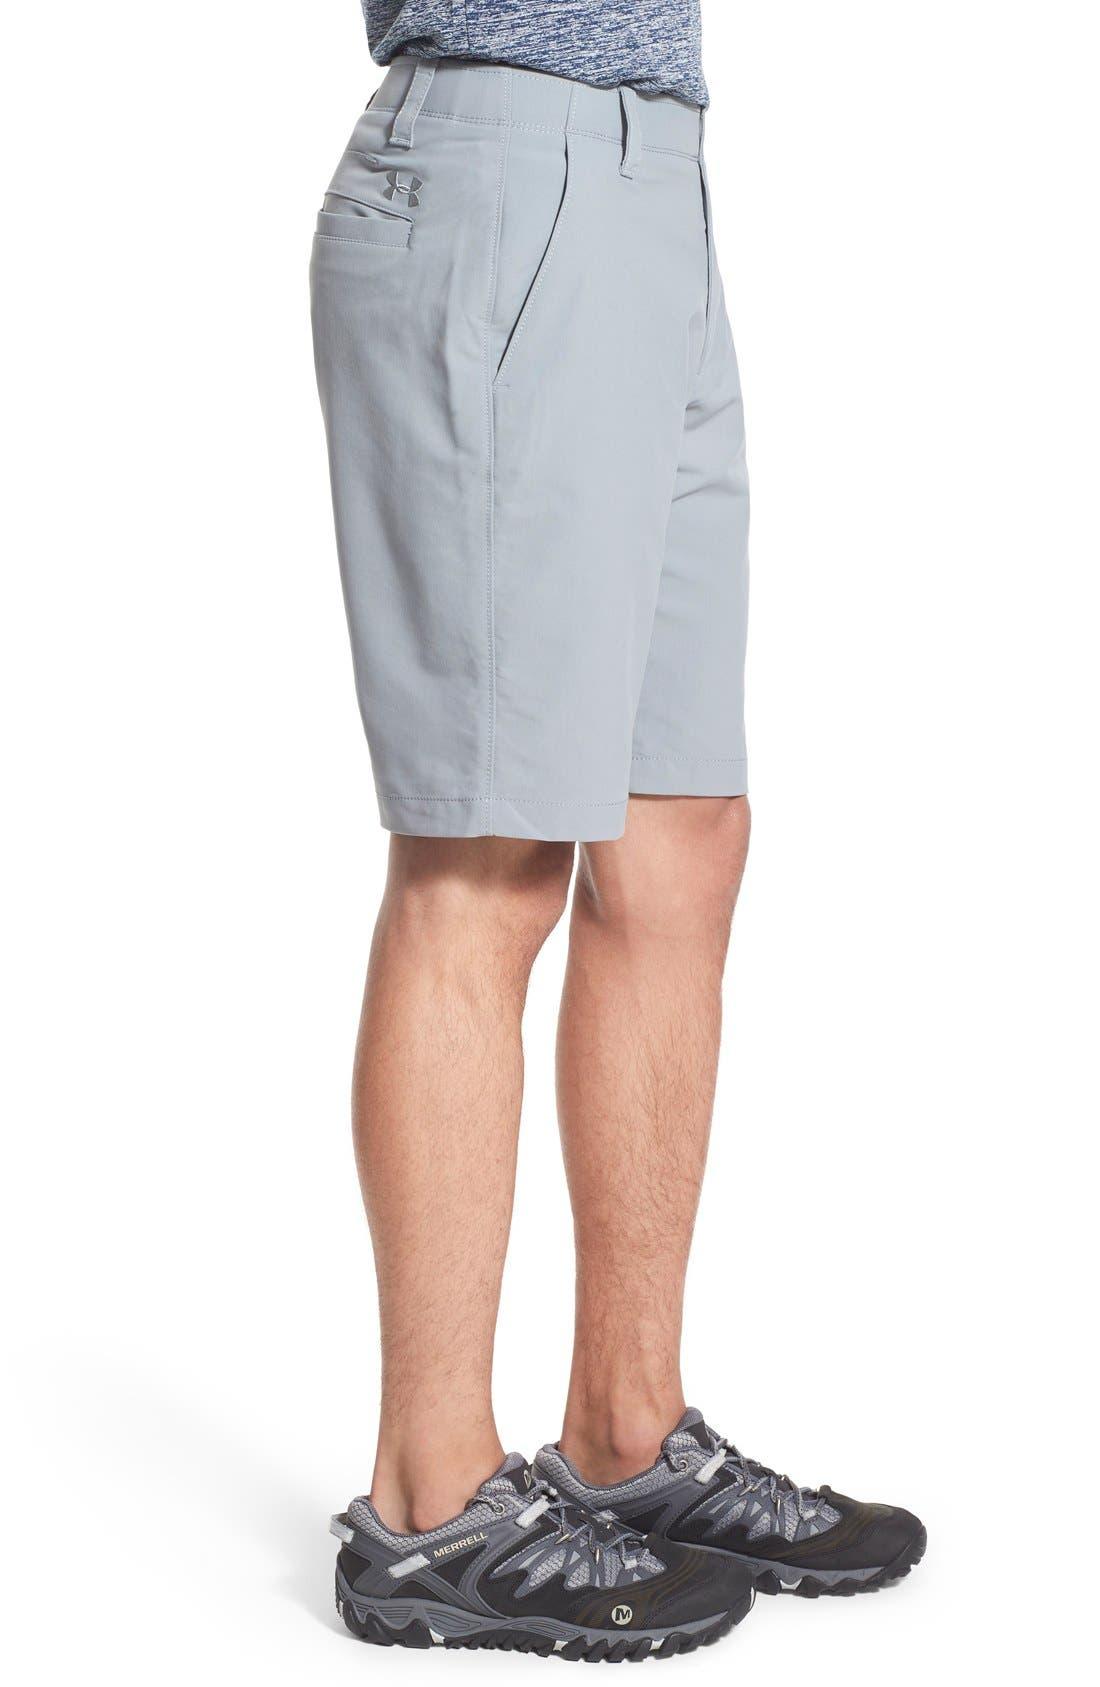 'Matchplay' Moisture Wicking Golf Shorts,                             Alternate thumbnail 6, color,                             035